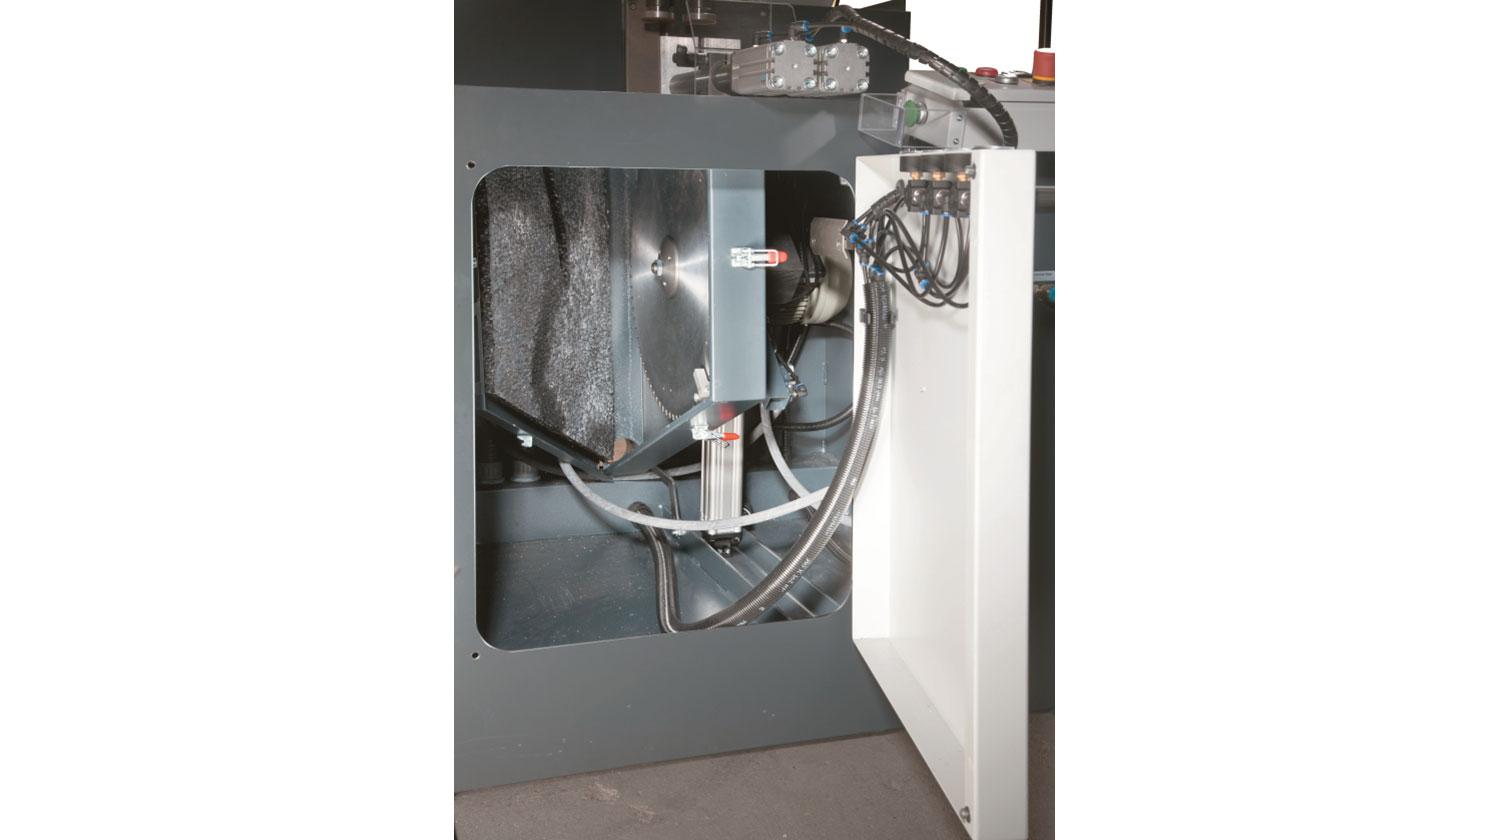 INT aluminum up cut saw Pressta Eisele GS 550 saw blade cabinet